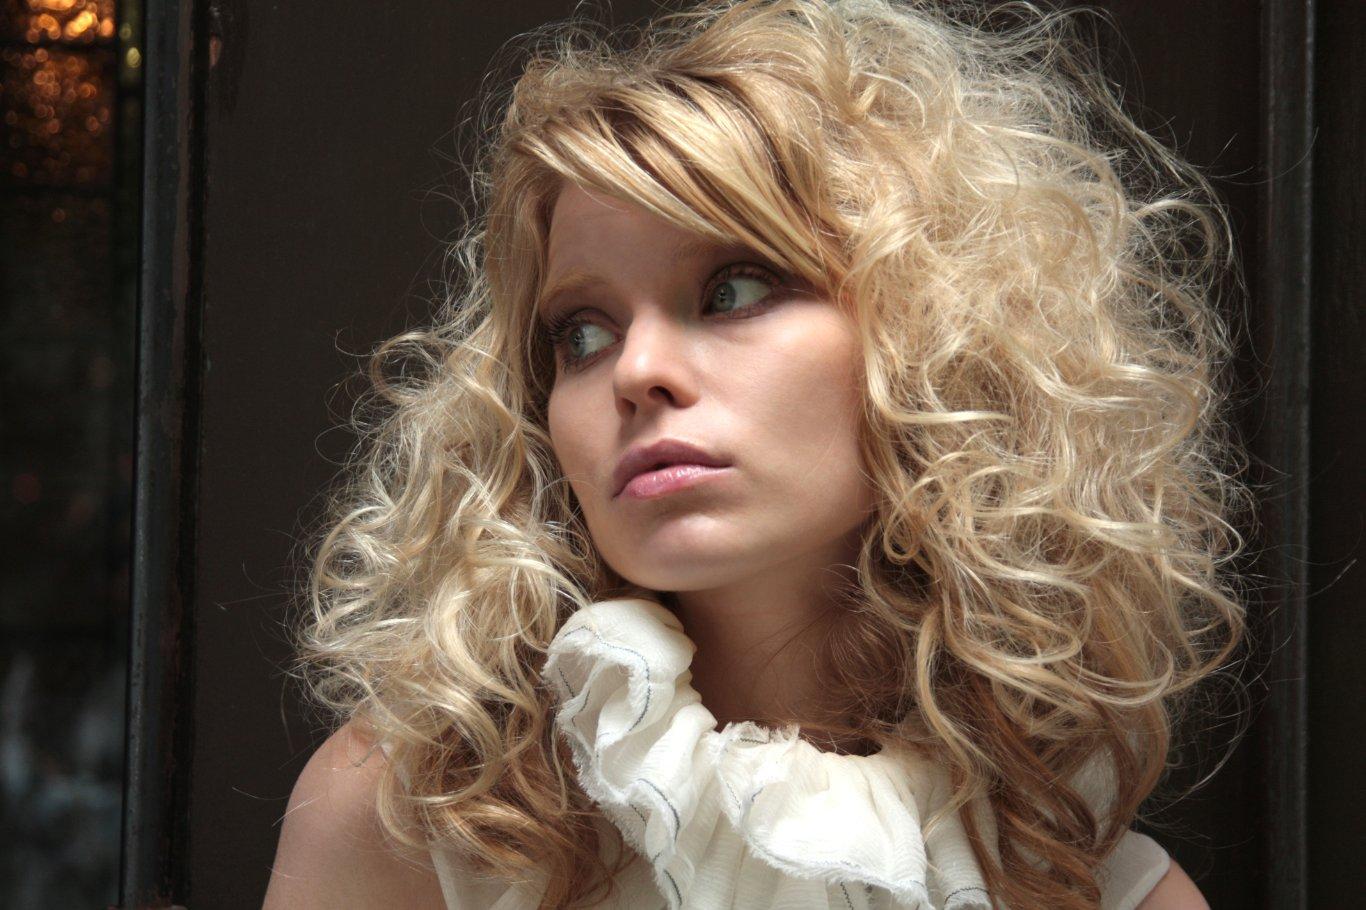 Discussion on this topic: Kristen Johnston born September 20, 1967 (age 51), gina-bramhill/